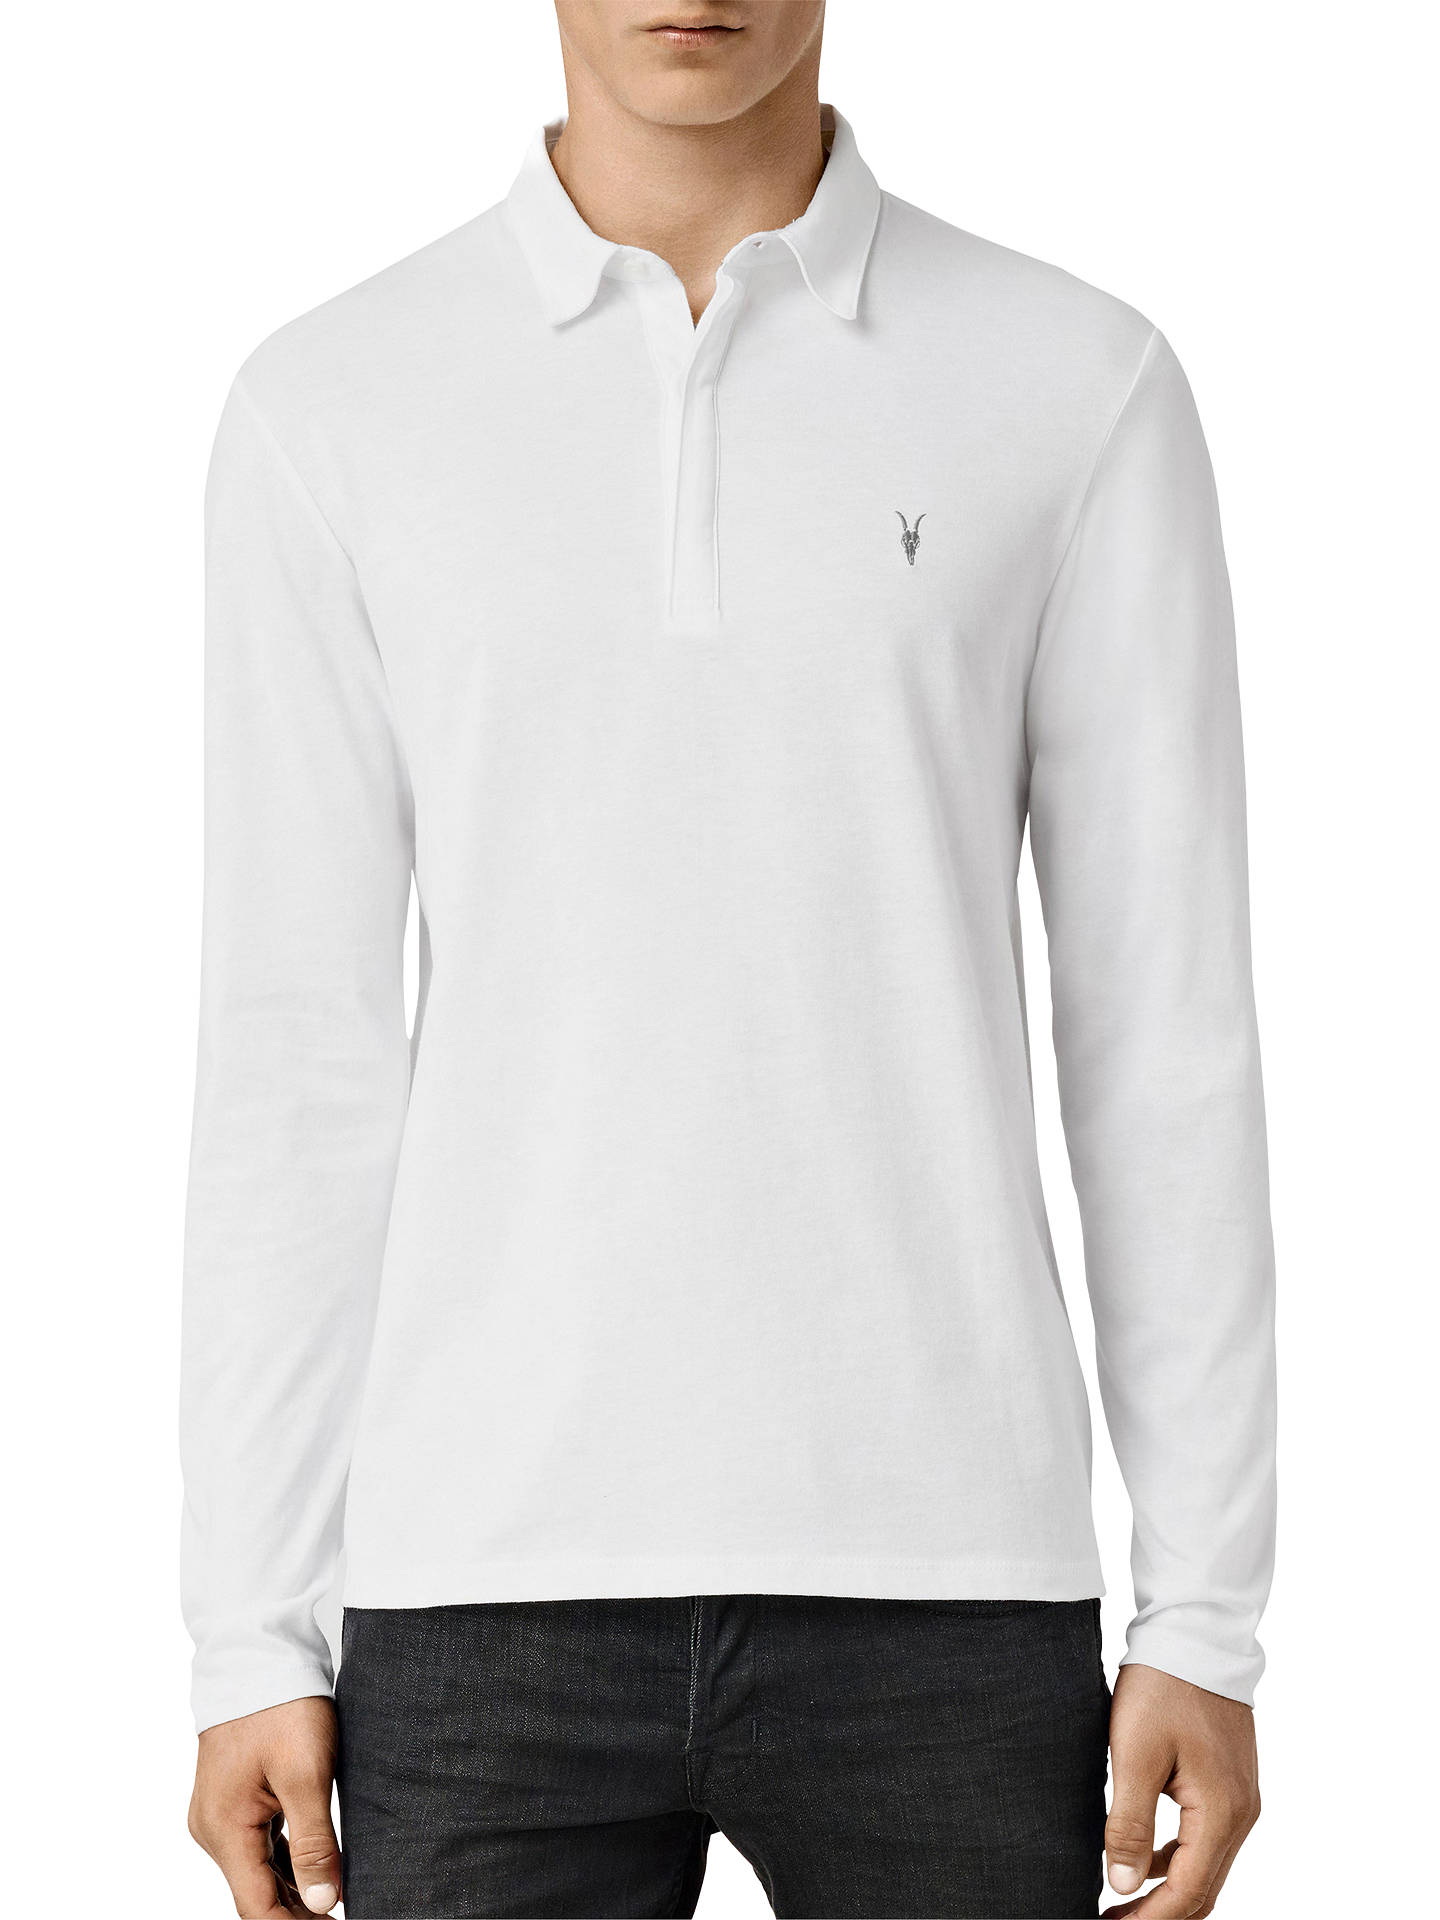 Allsaints Brace Long Sleeve Polo Shirt Optic White At John Lewis